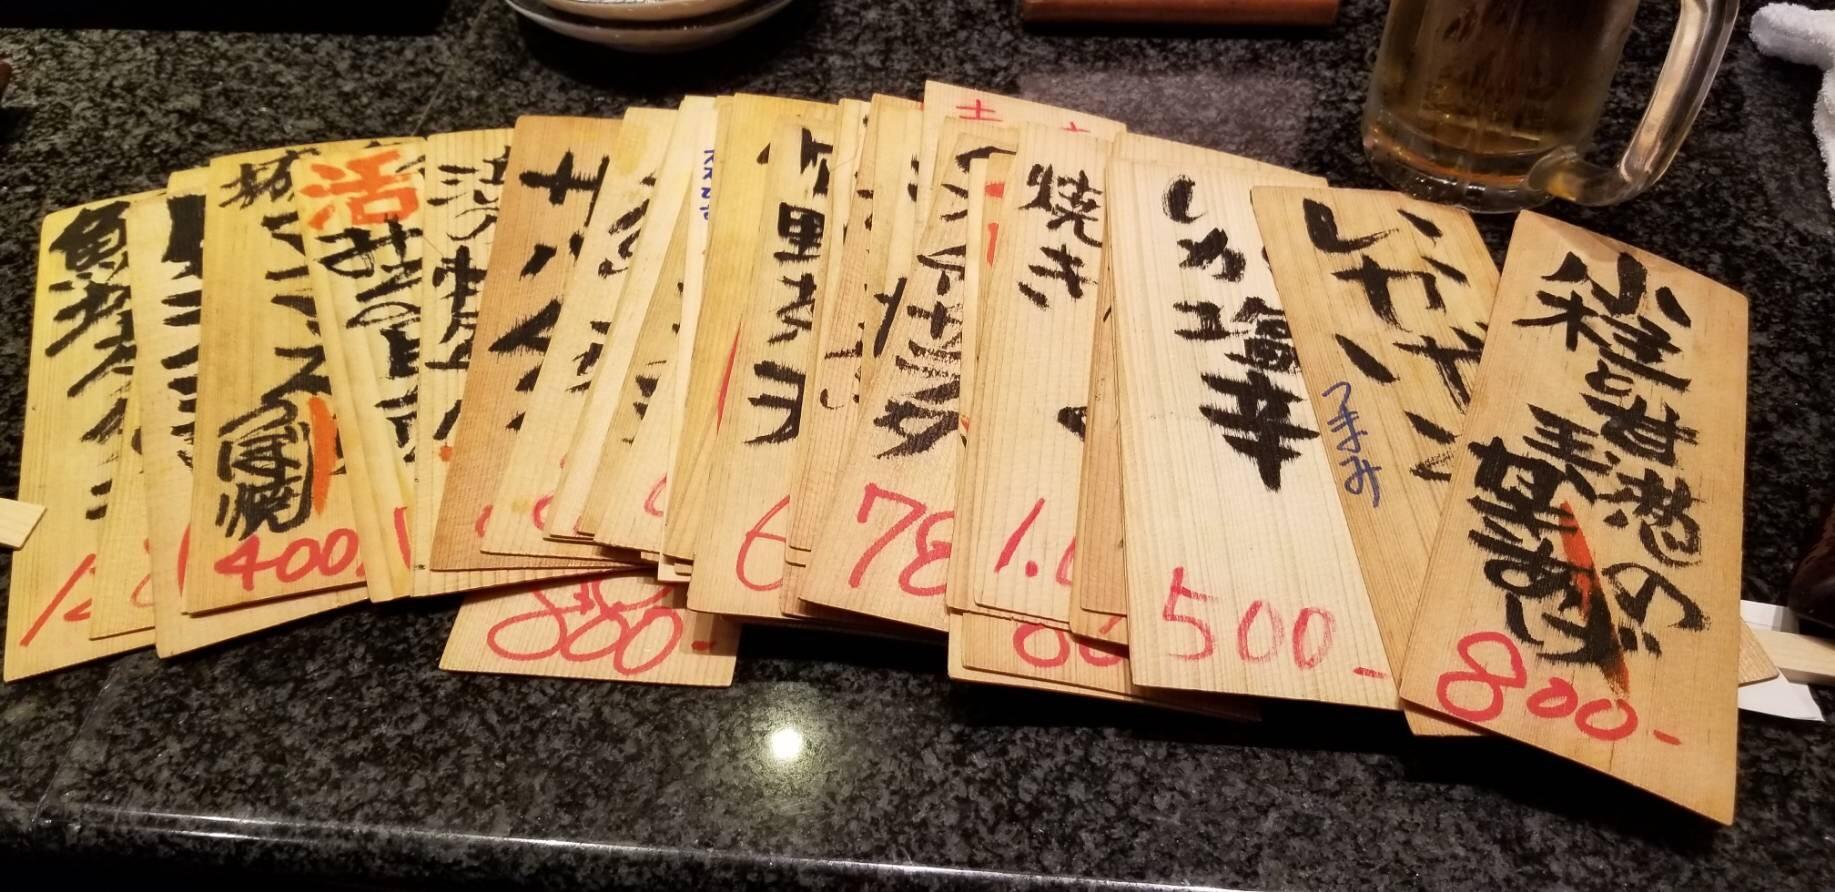 すし居酒屋 魚浜@学芸大学_a0223786_08143096.jpg